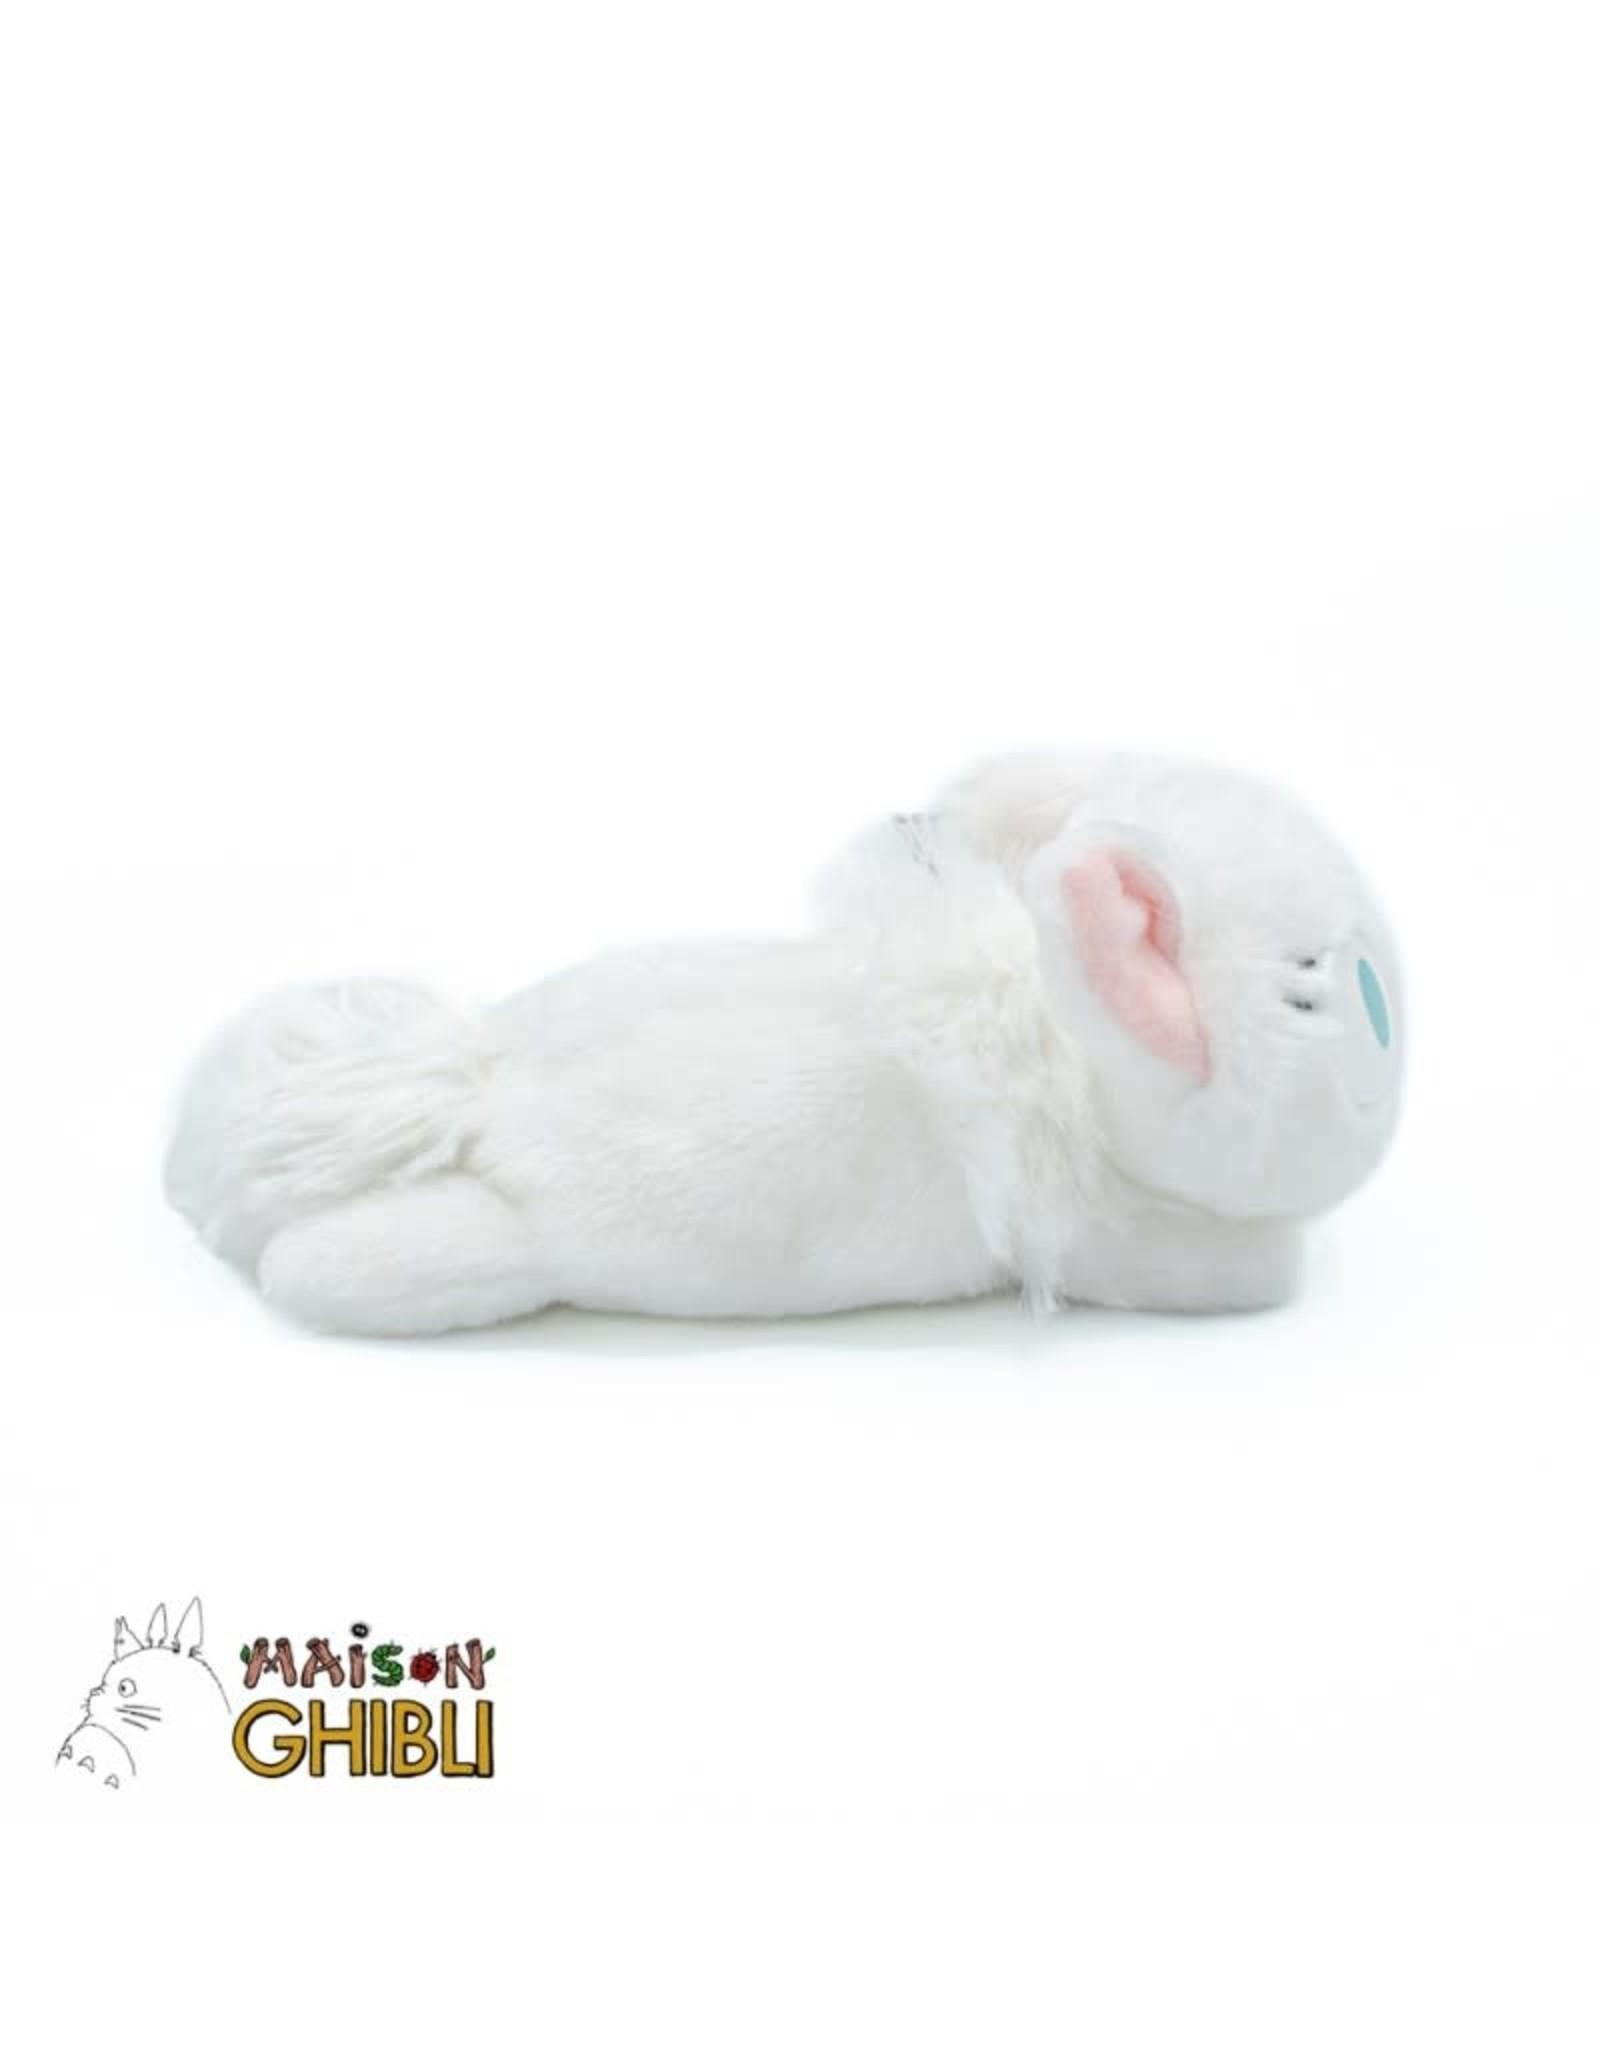 Lily - Fluffy Beanie Plush Figure 15 cm - Studio Ghibli - Kiki's Delivery Service